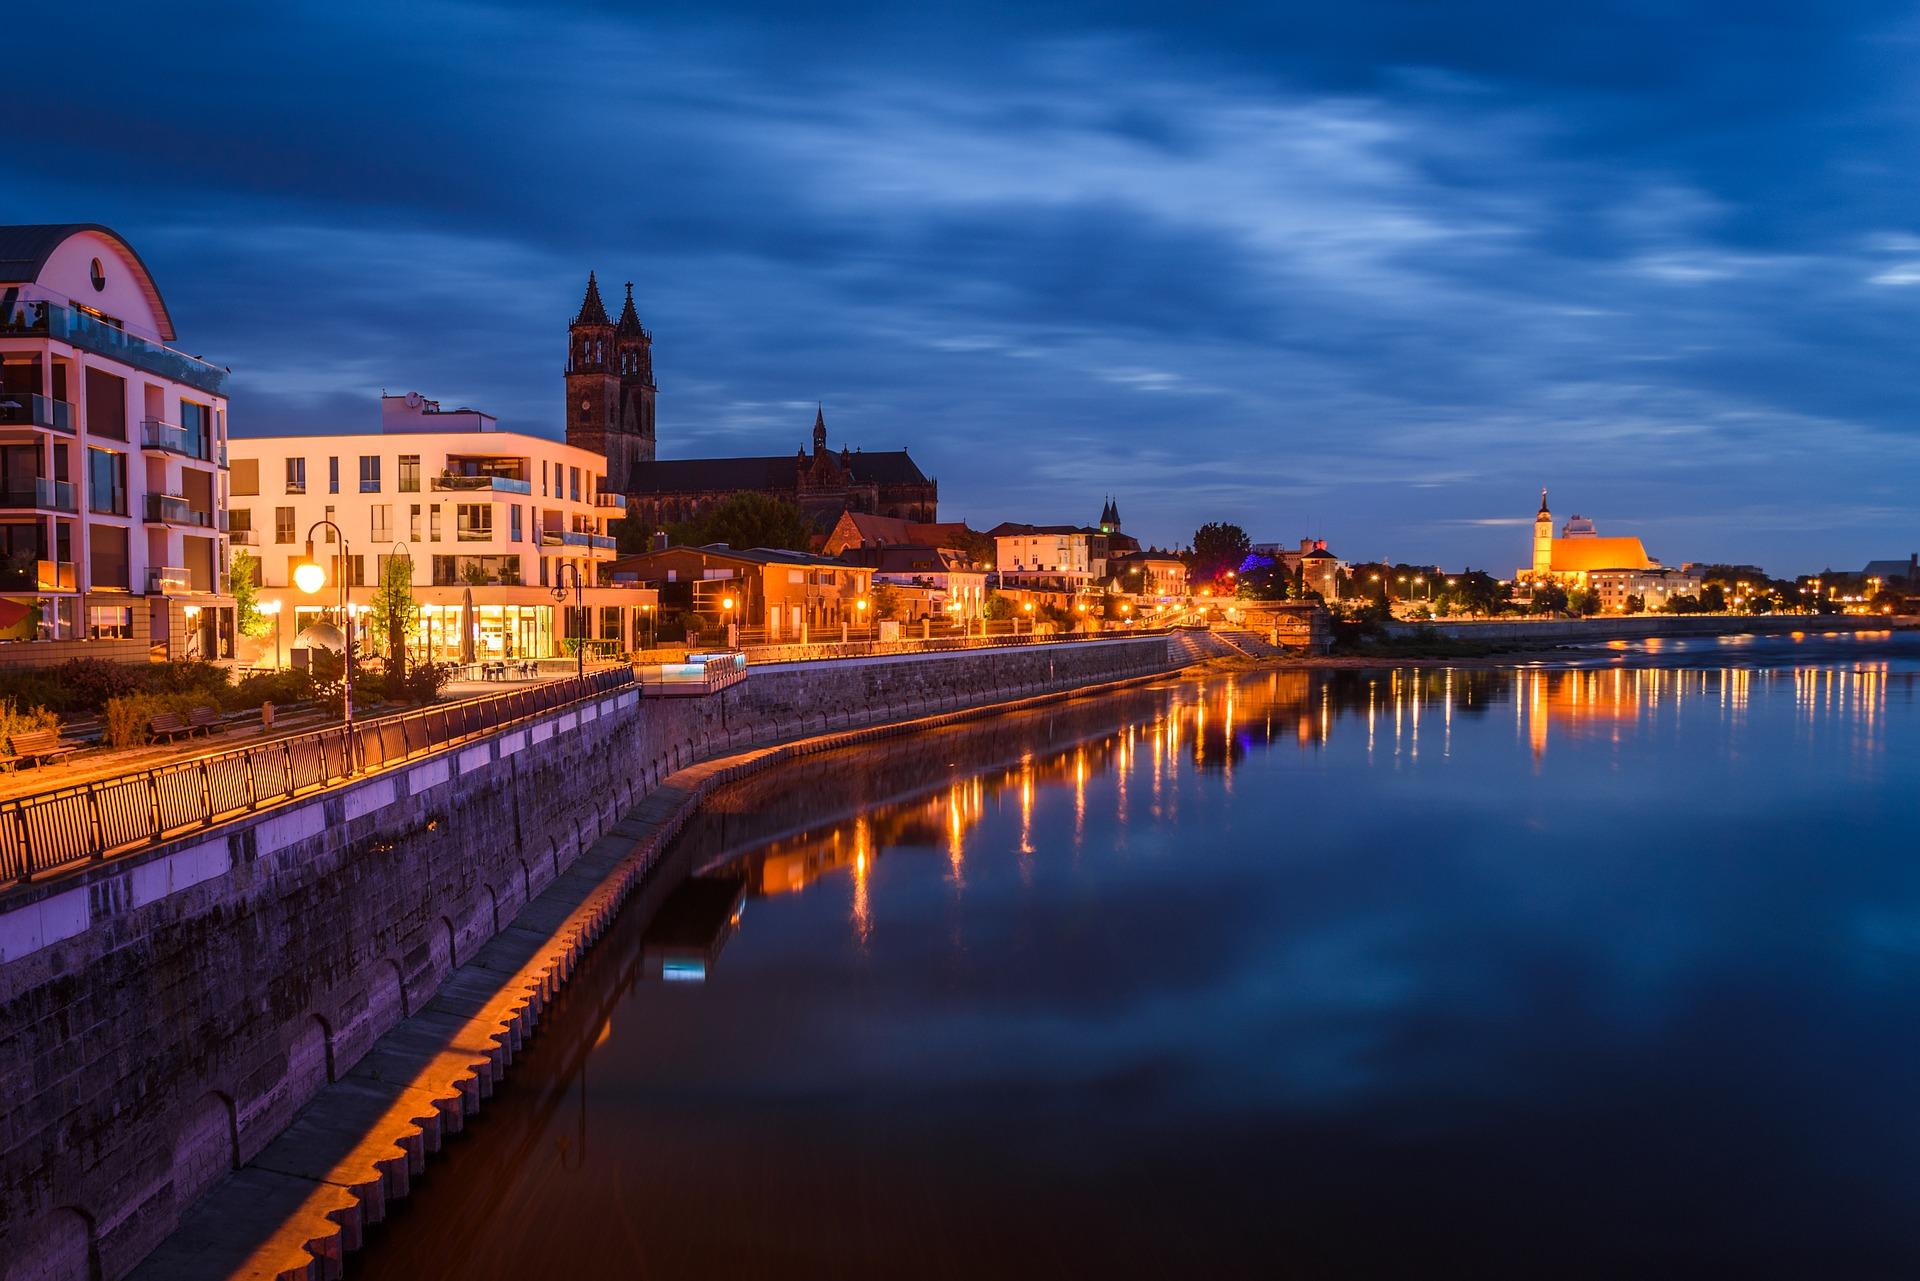 Panorama der Elbe in Magdeburg